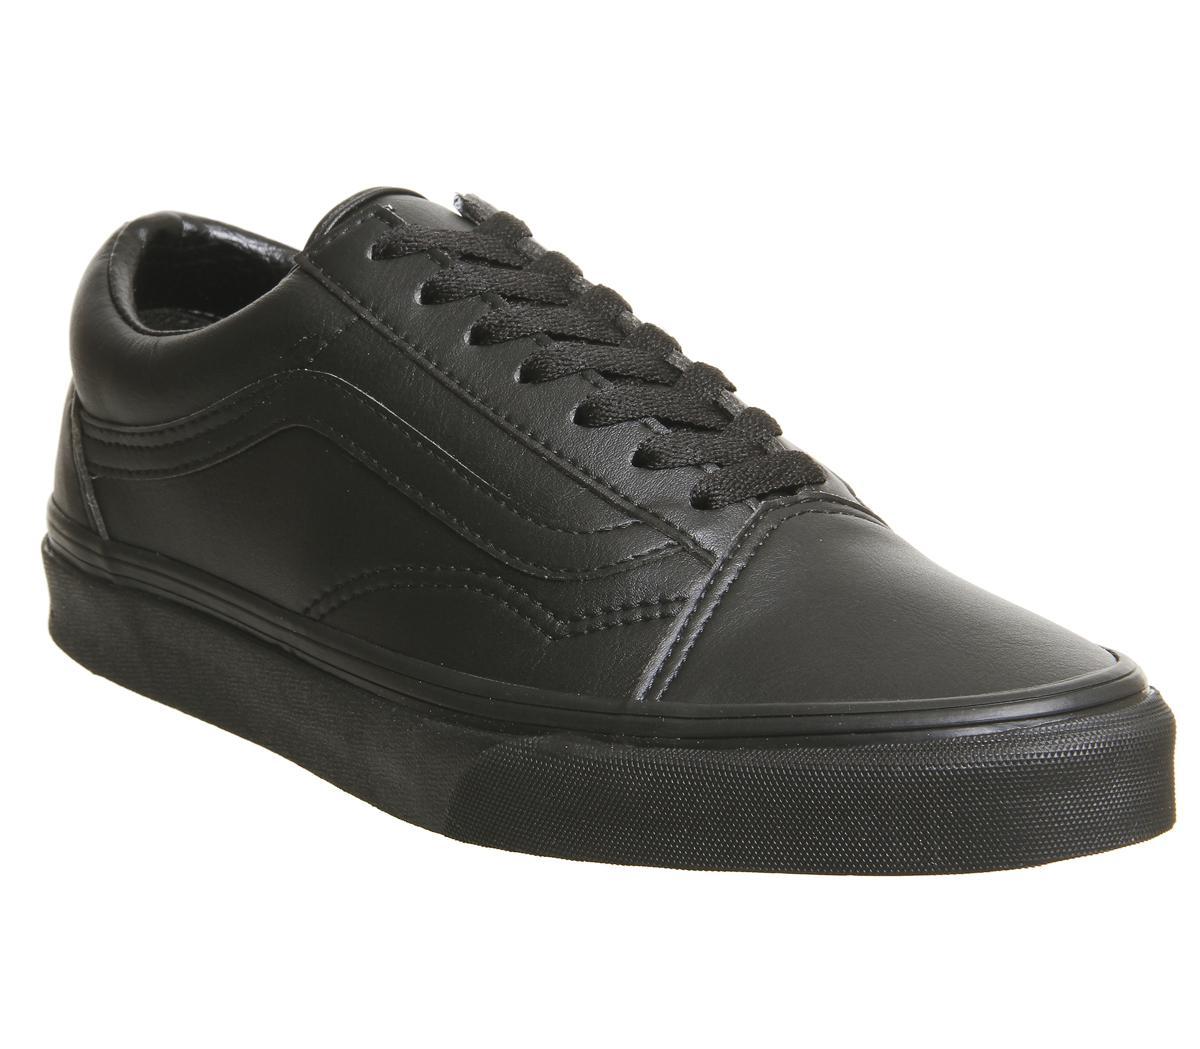 Vans Old Skool Black Black Mono Leather